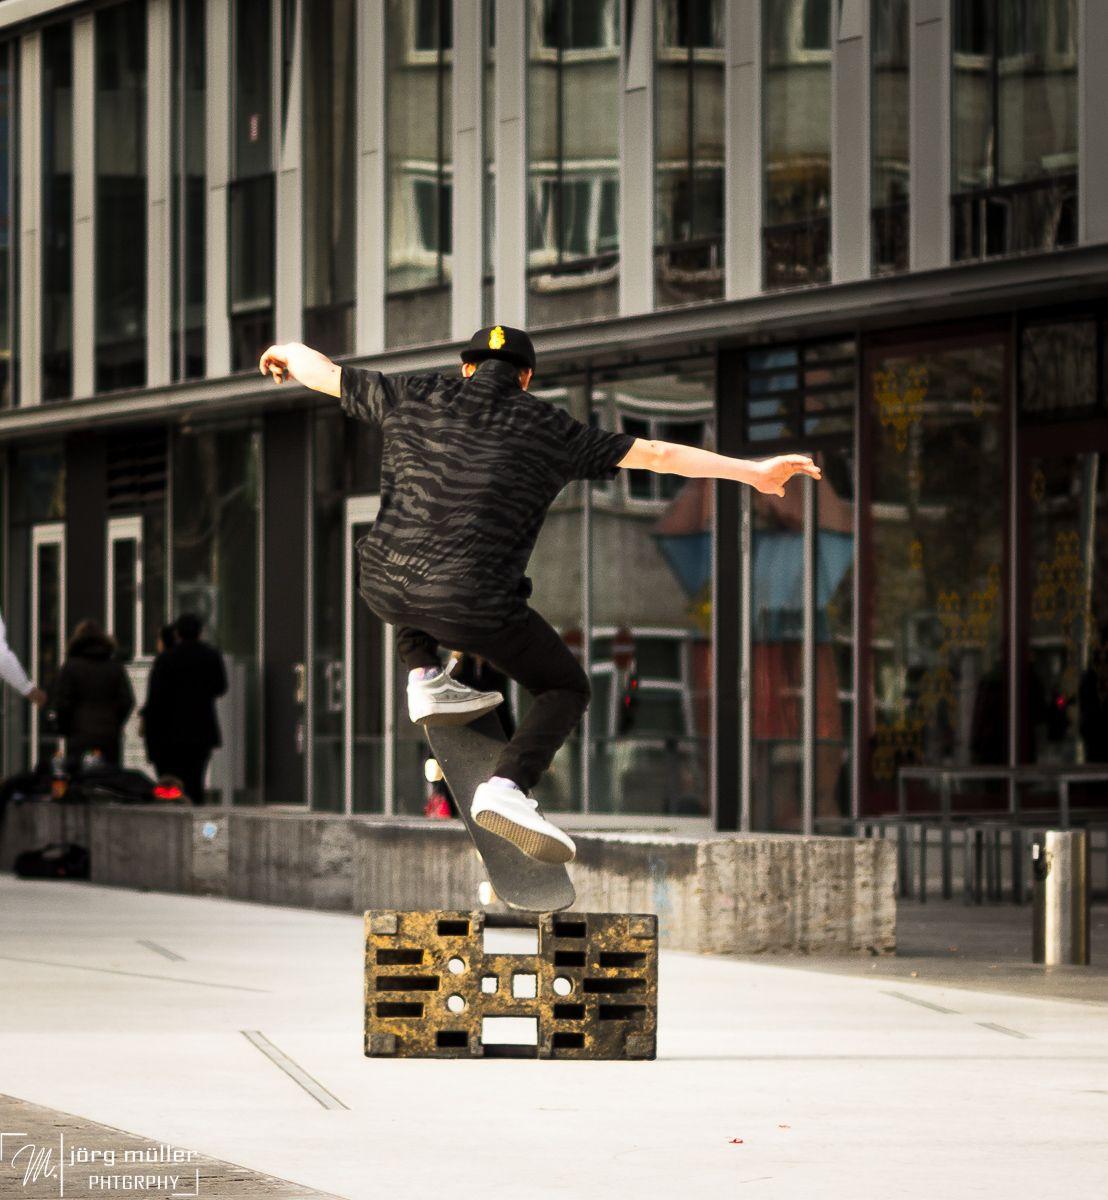 Street, skating, lilfestyle, fun - Stuttgart/Germany